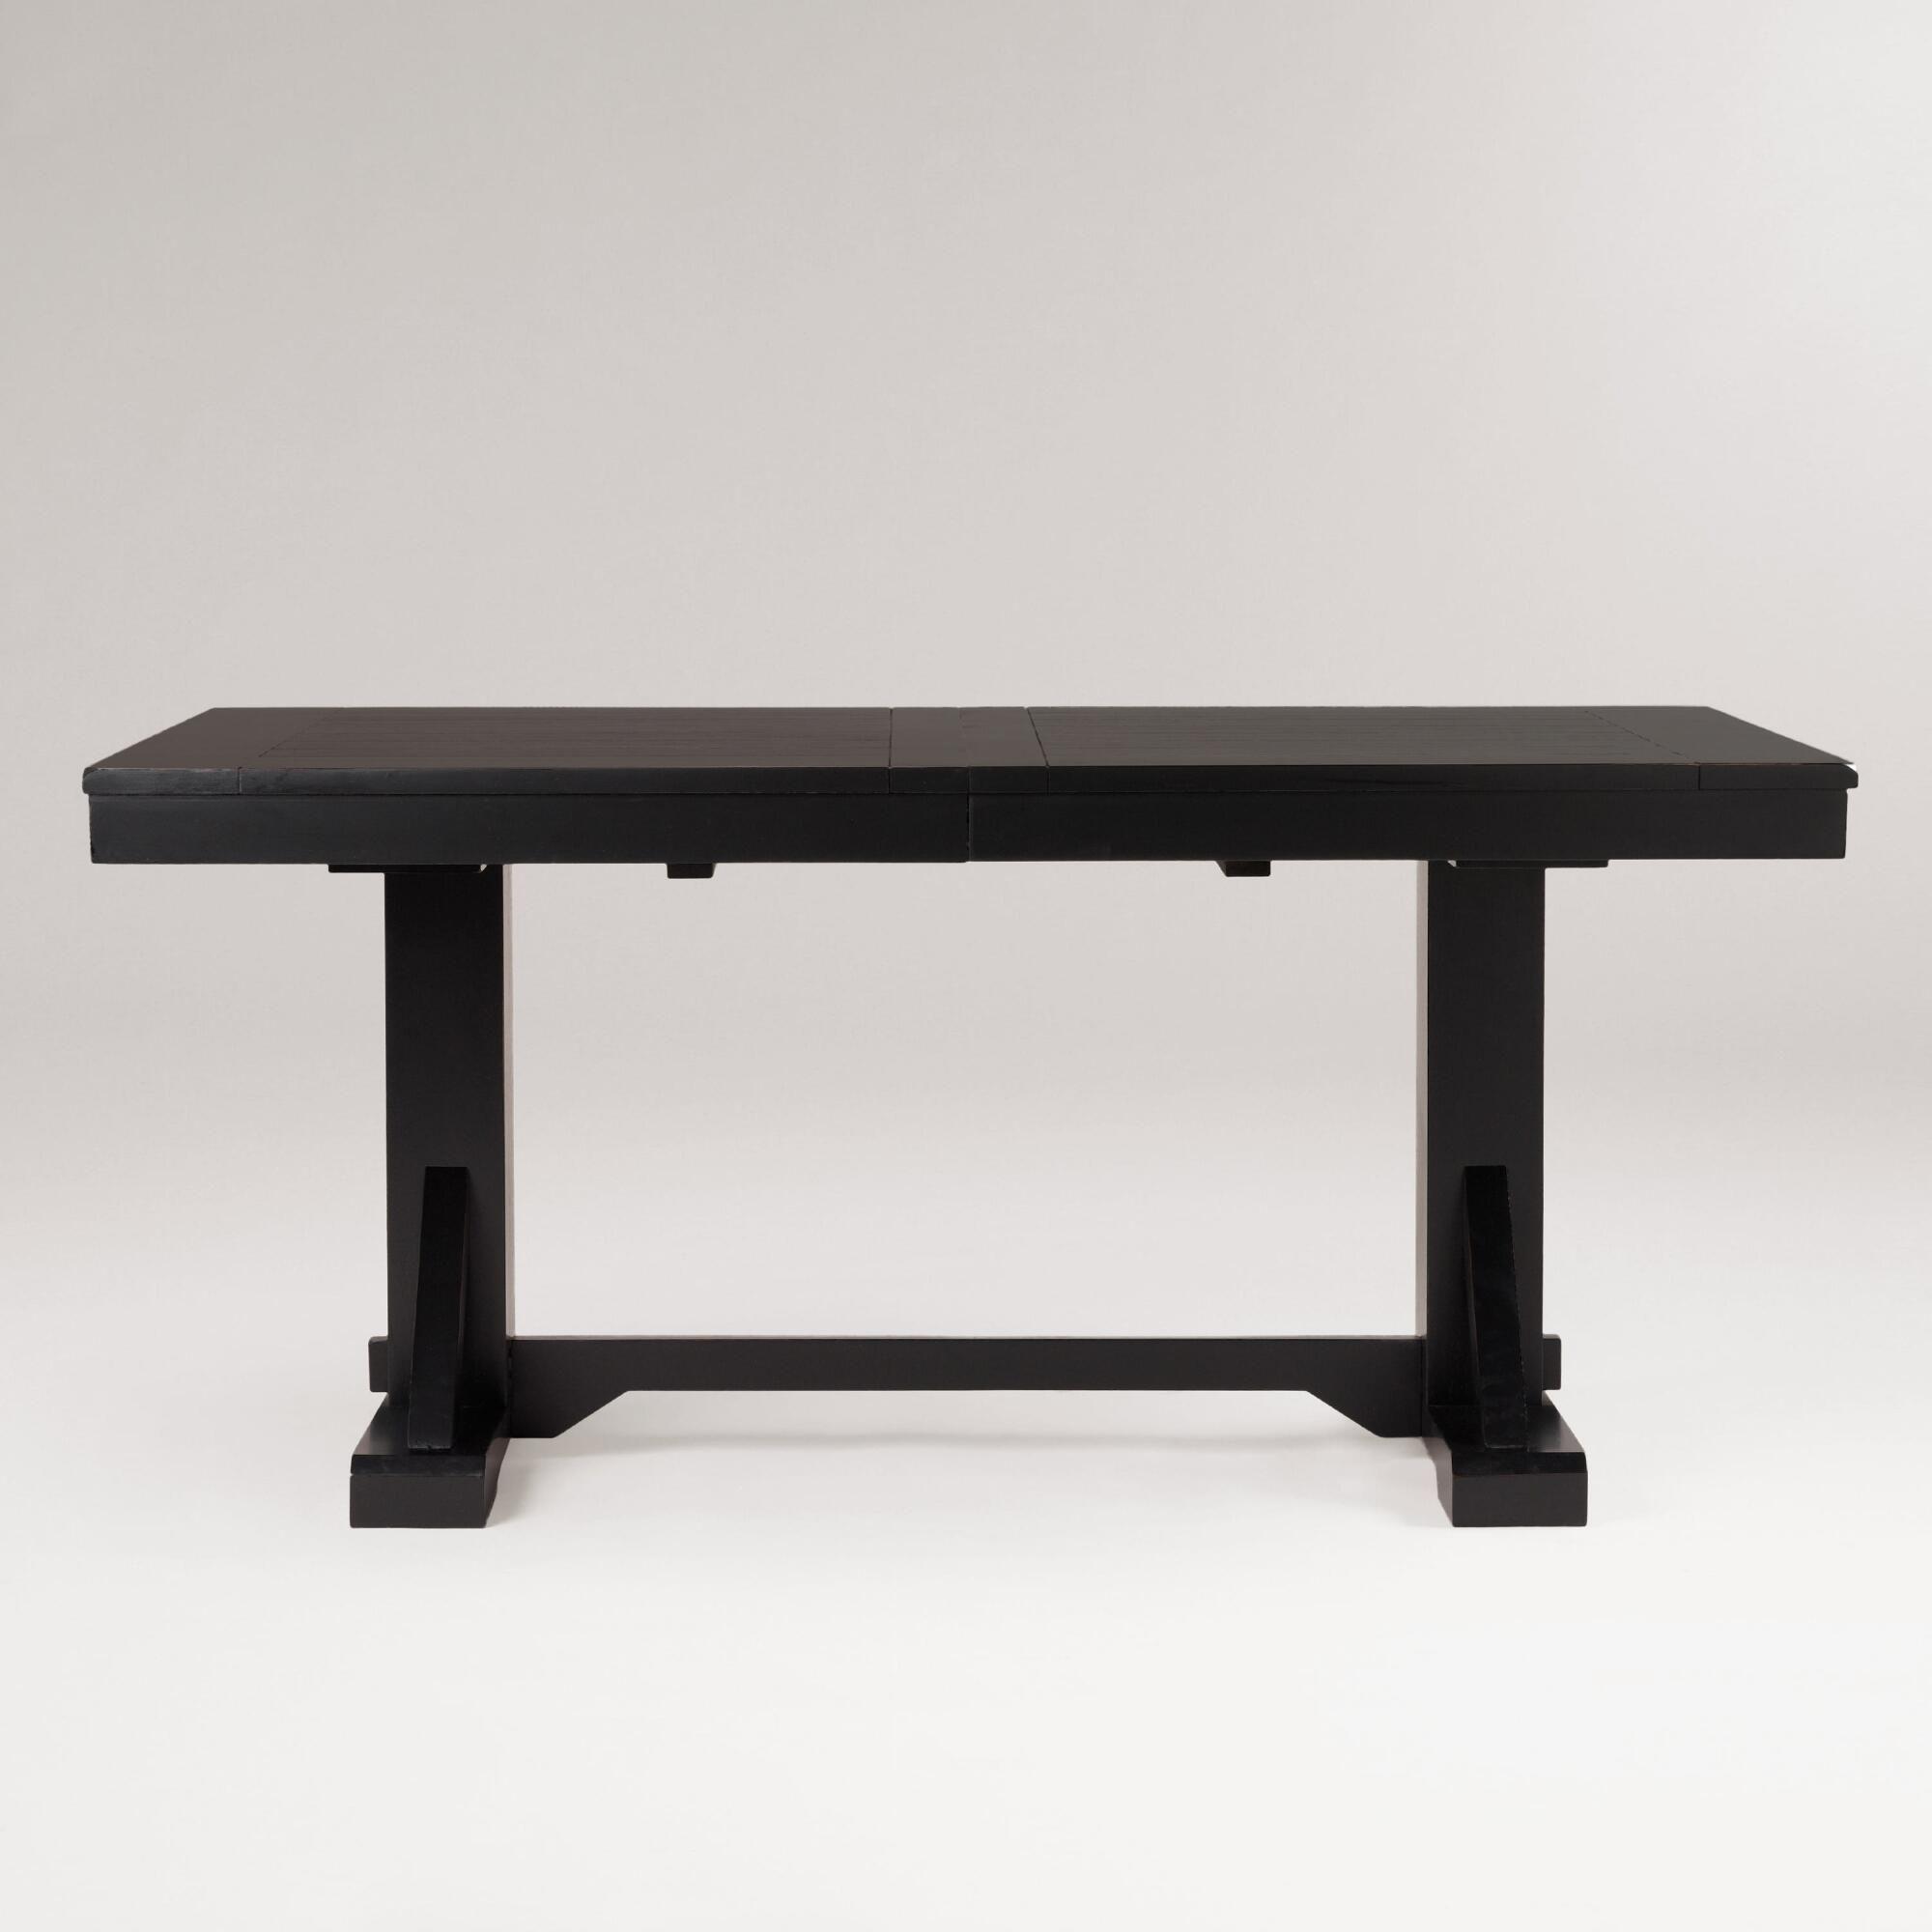 Superb Antique Black Verona Trestle Table World Market Client Ibusinesslaw Wood Chair Design Ideas Ibusinesslaworg